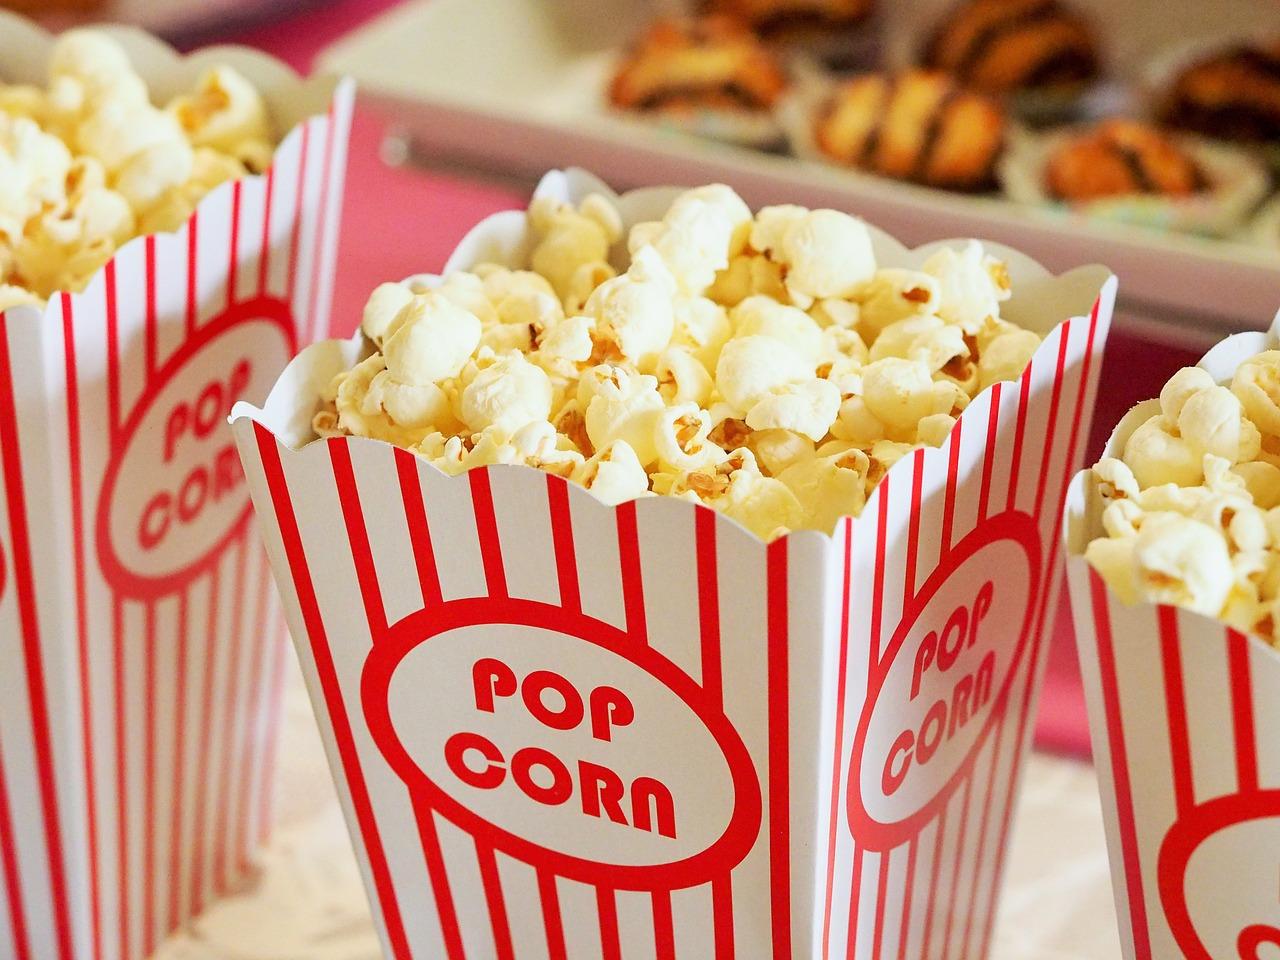 popcorn-1085072_1280.jpg